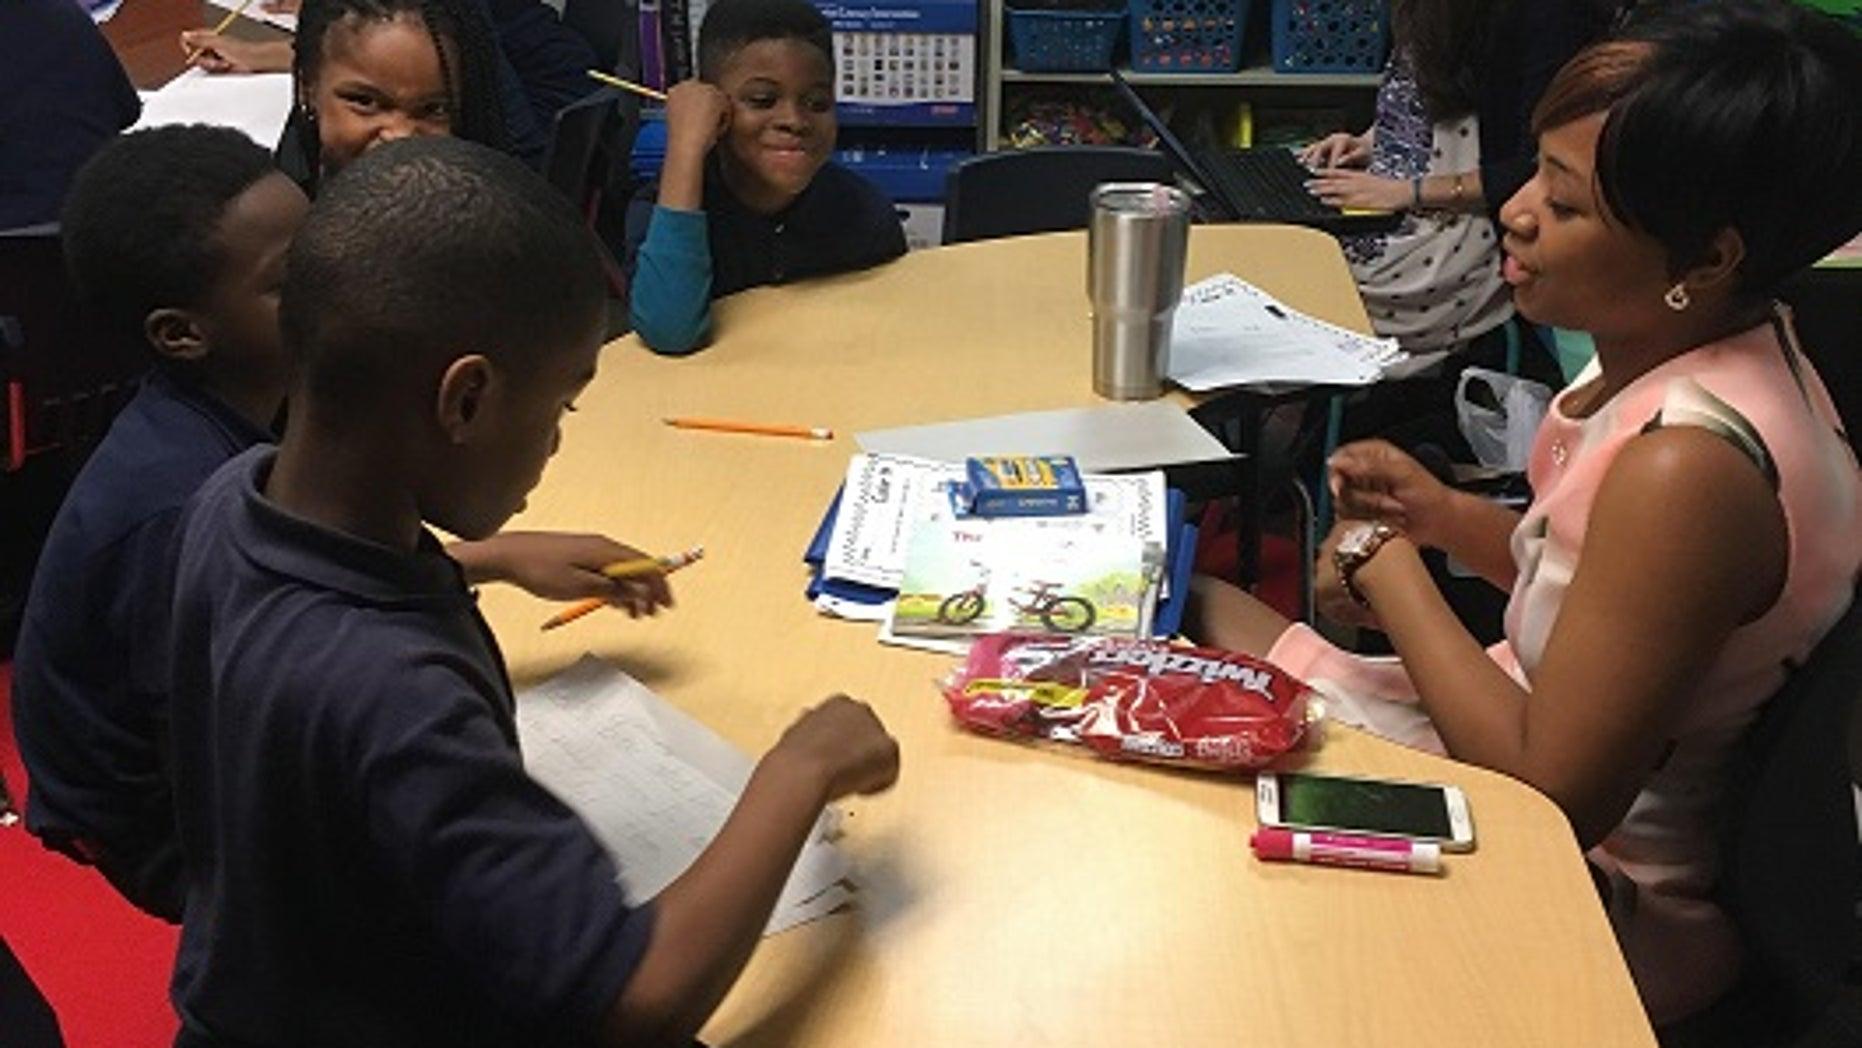 18-year-old Raven Osborne teaching elementary school children at 21st Century Charter School in Gary, Indiana on April 25, 2017.